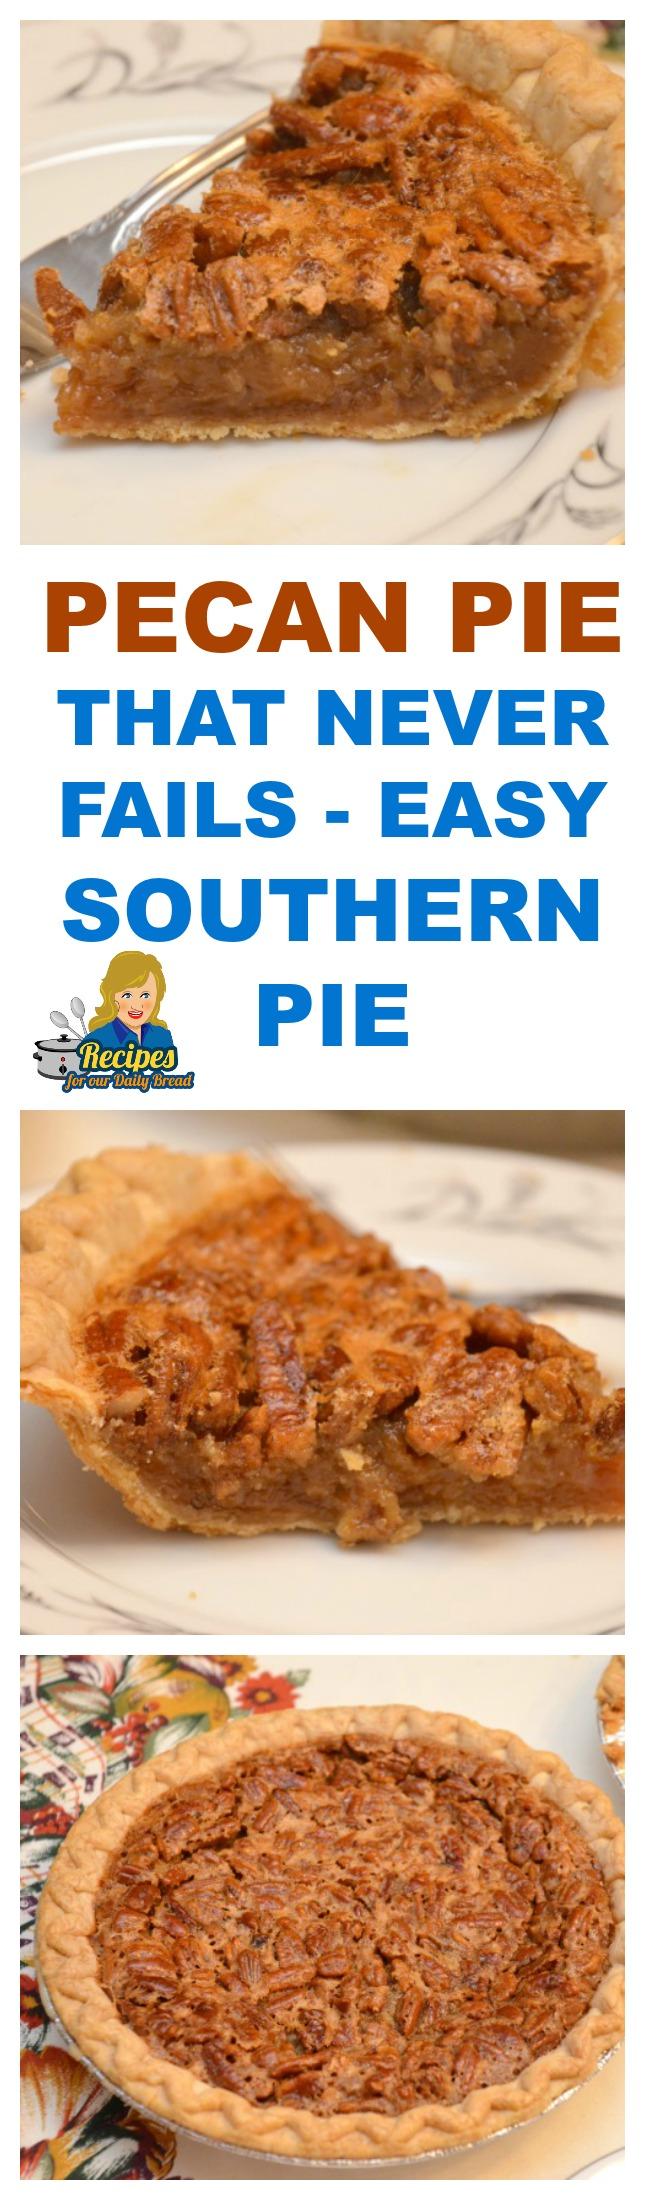 Never Fail Pecan Pie  - Pies -